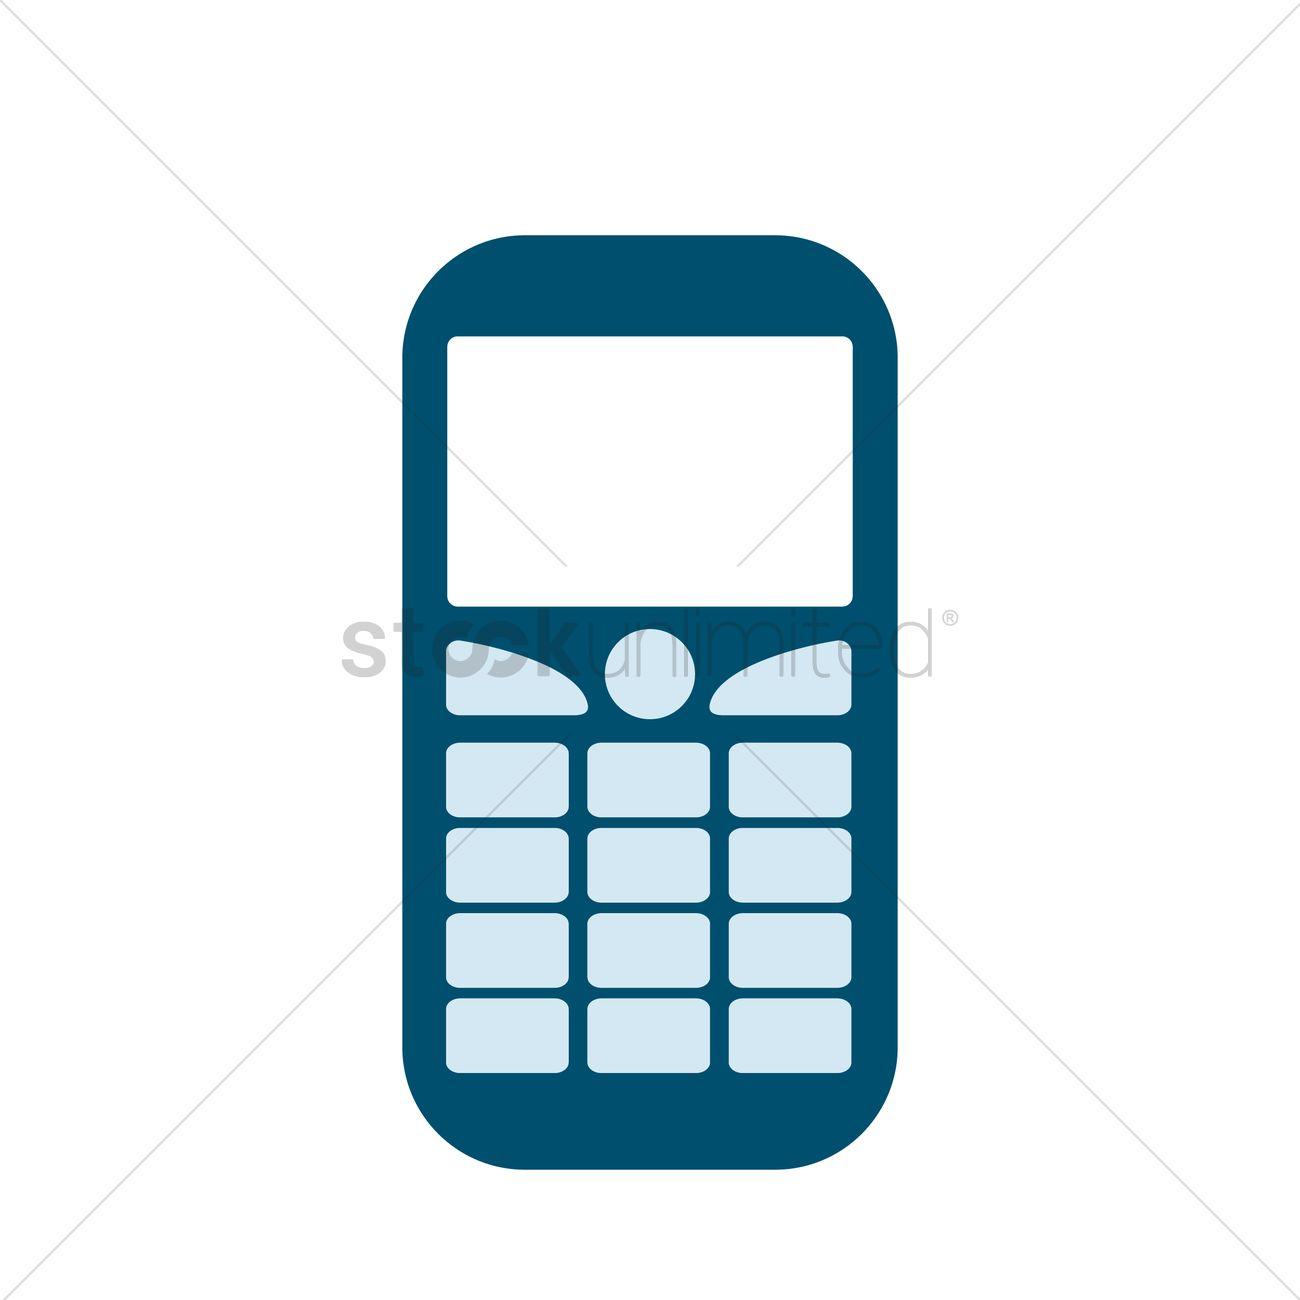 Free A handphone Vector Image.